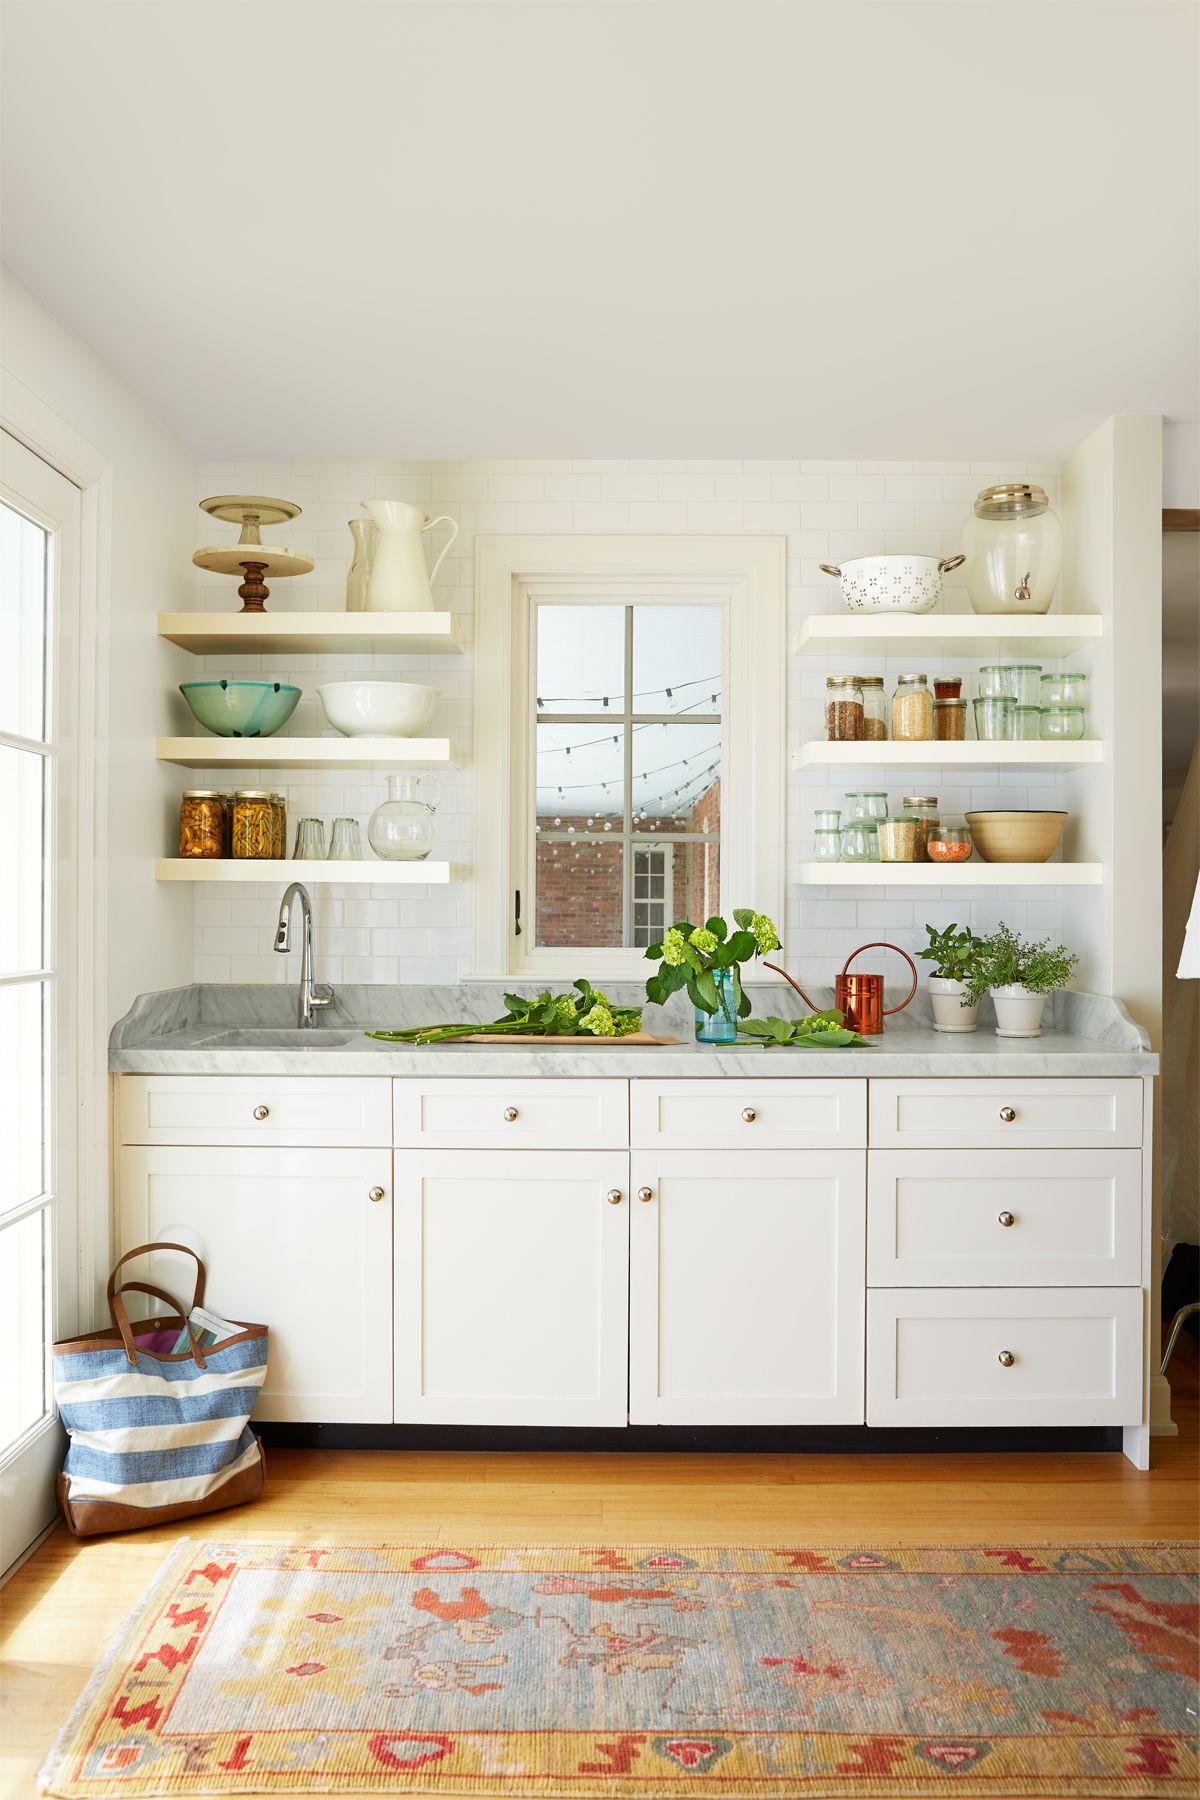 8 Ways to Add Bright Summer Style to Your Kitchen | Kitchen yellow ...